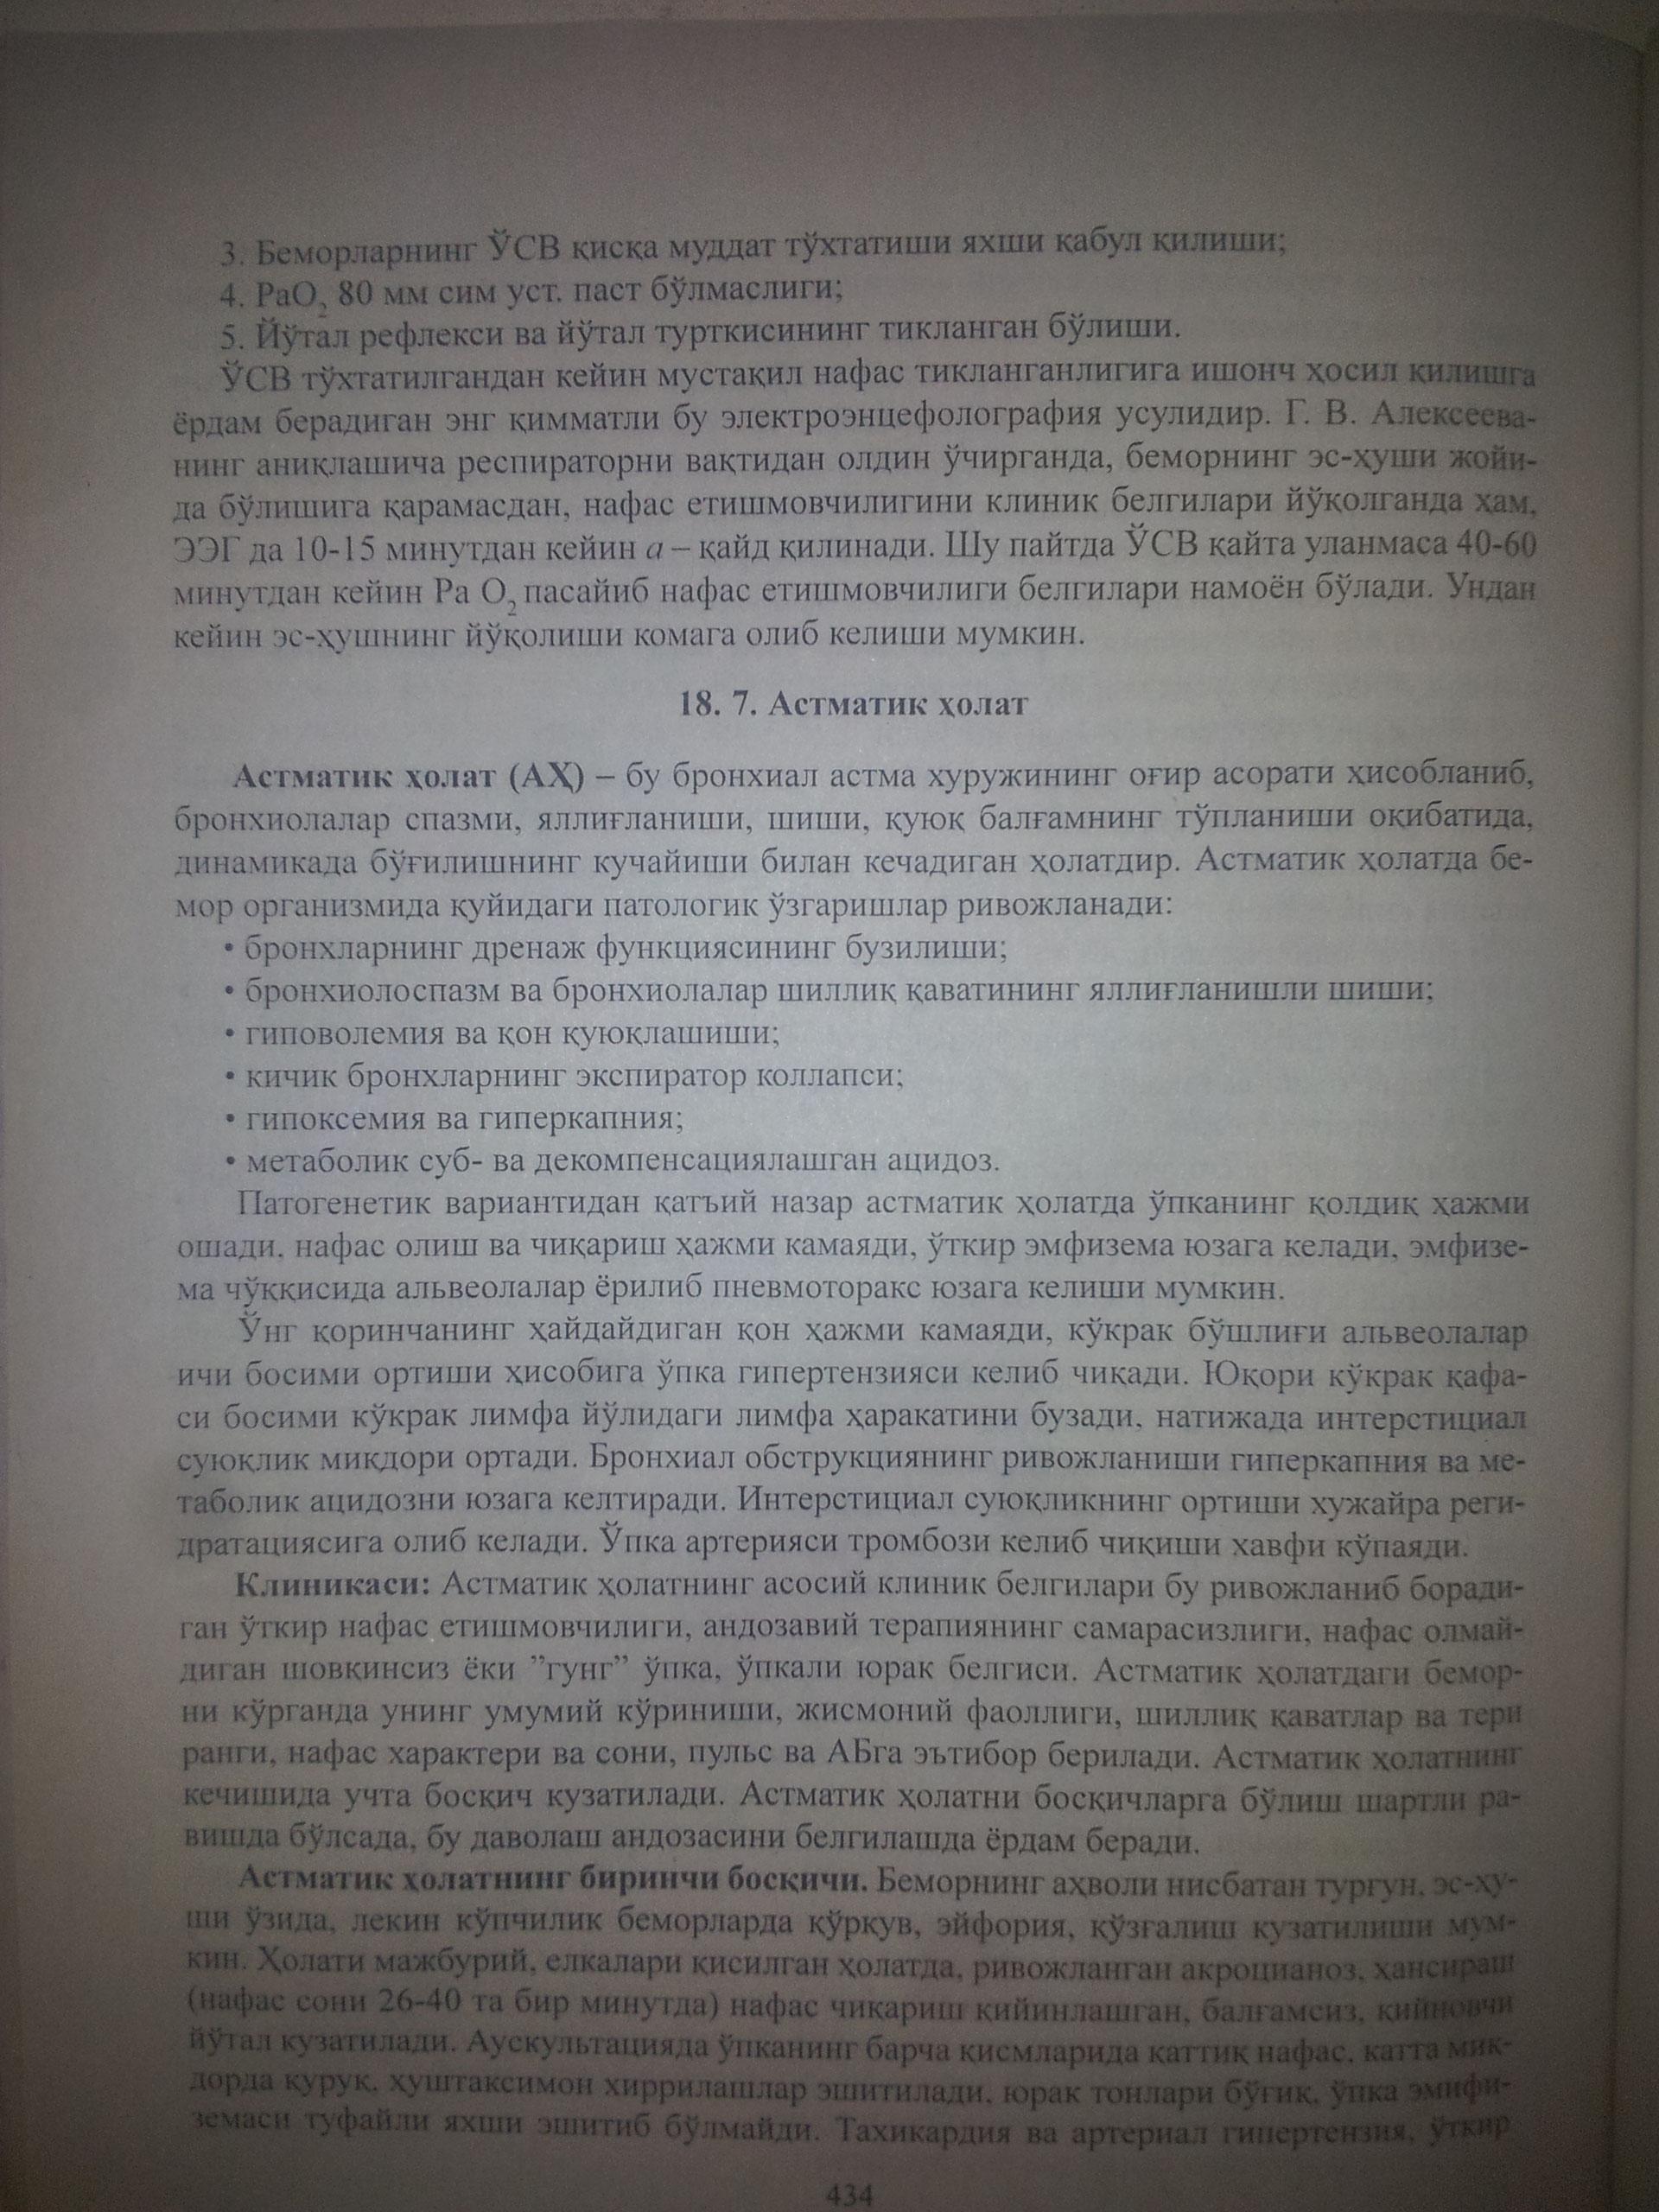 Огзига Олиш Мумкинми